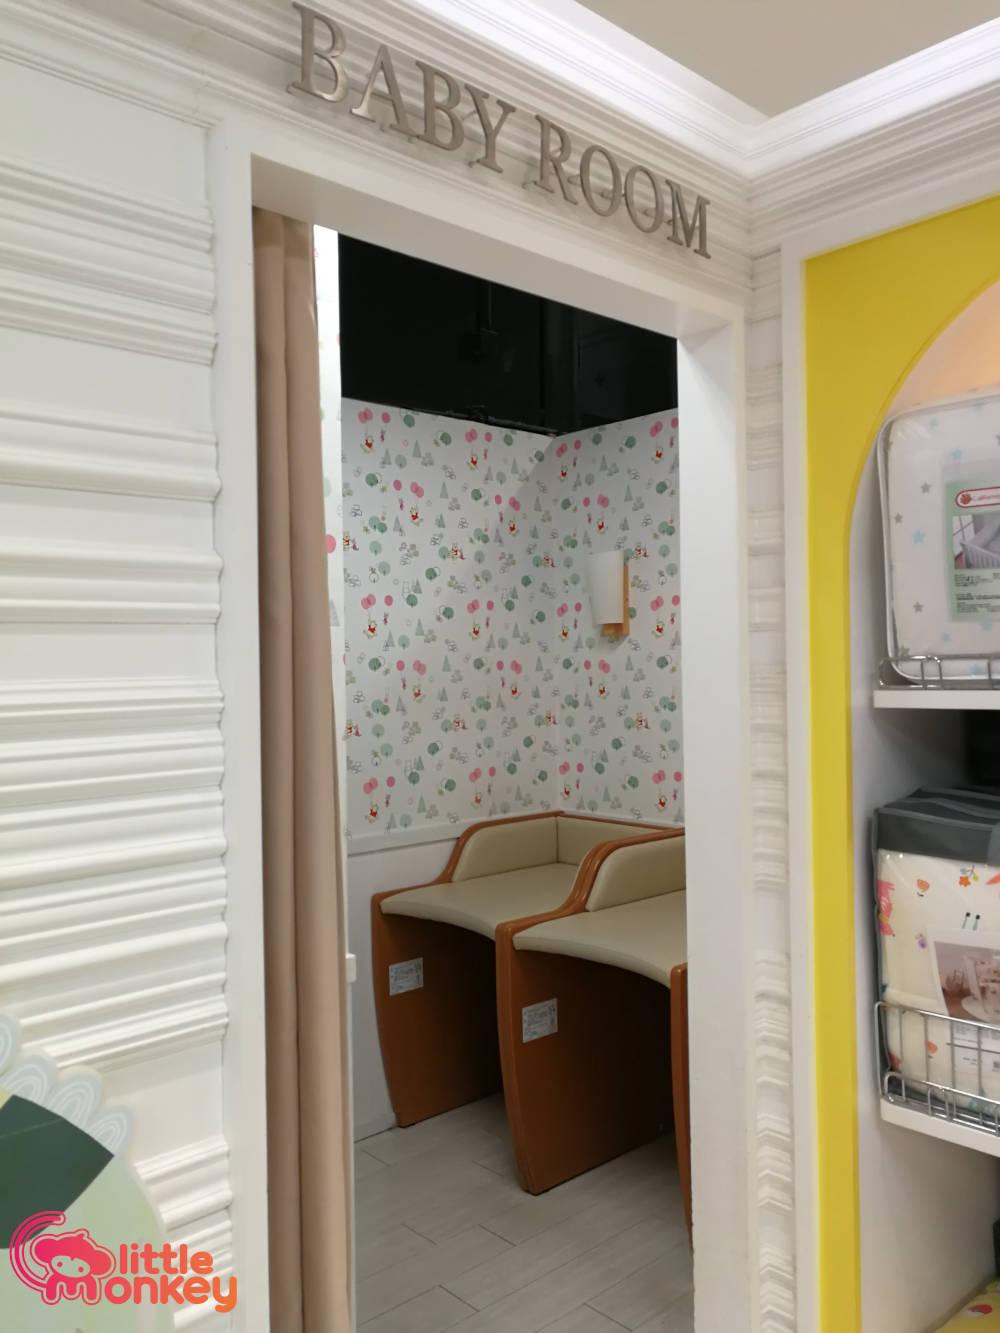 Apita Department Store's entrance door of the baby room